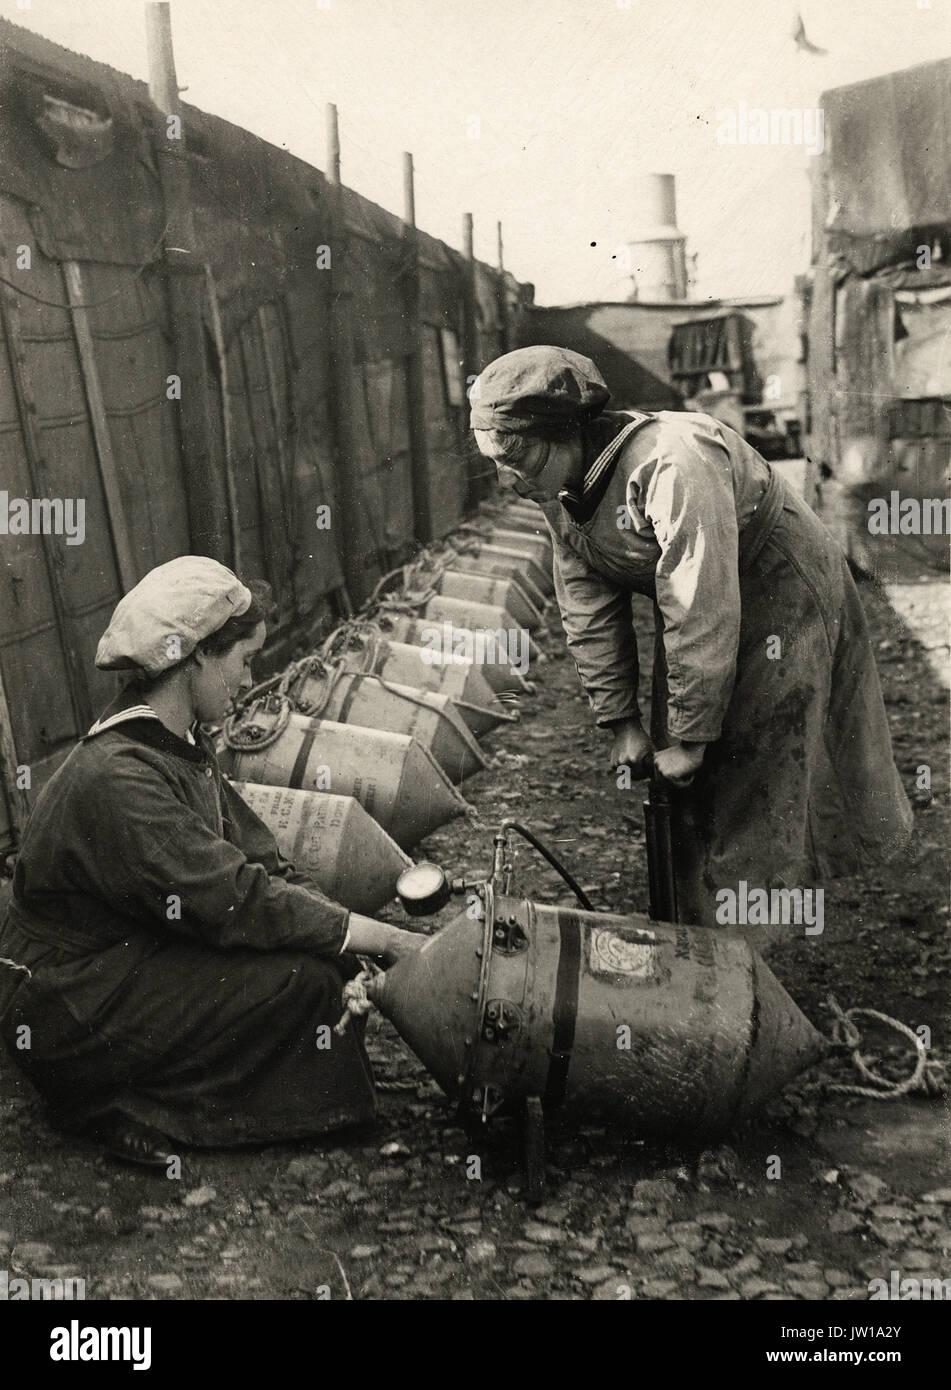 Women testing a mine with air presssure - Alternative Title: Women's Work - Stock Image